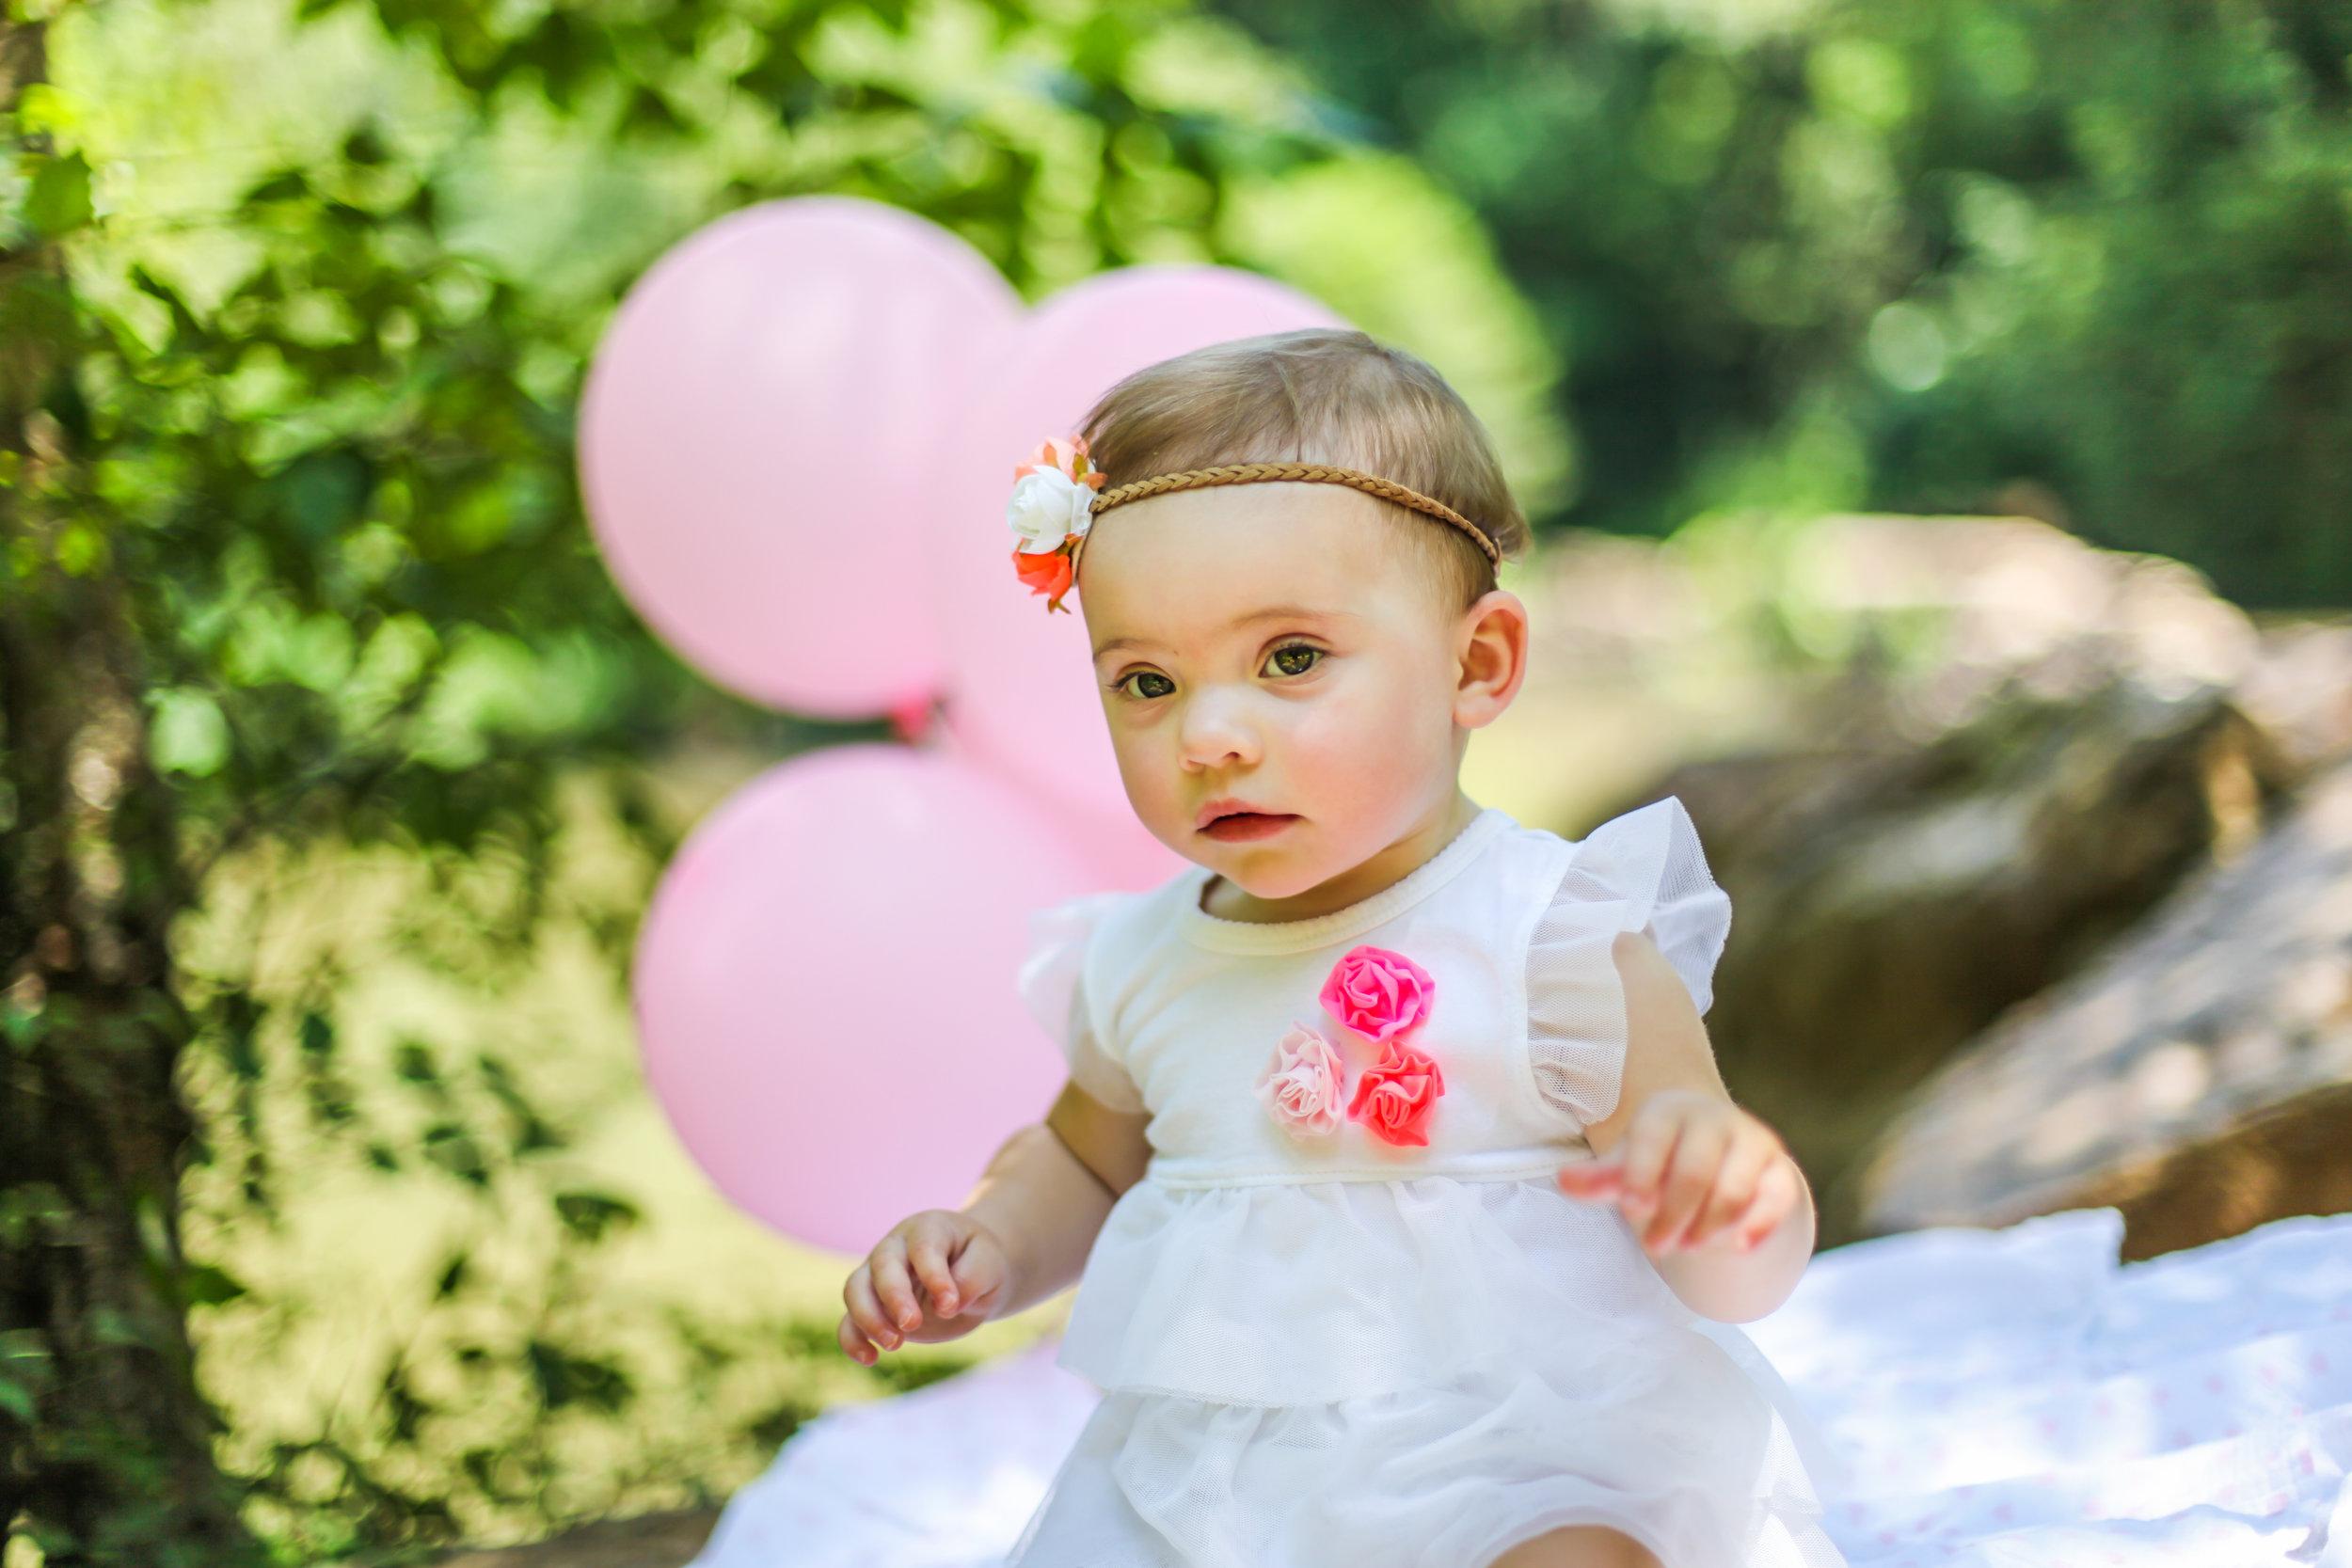 woodstock baby photography angela elliott-78.jpg